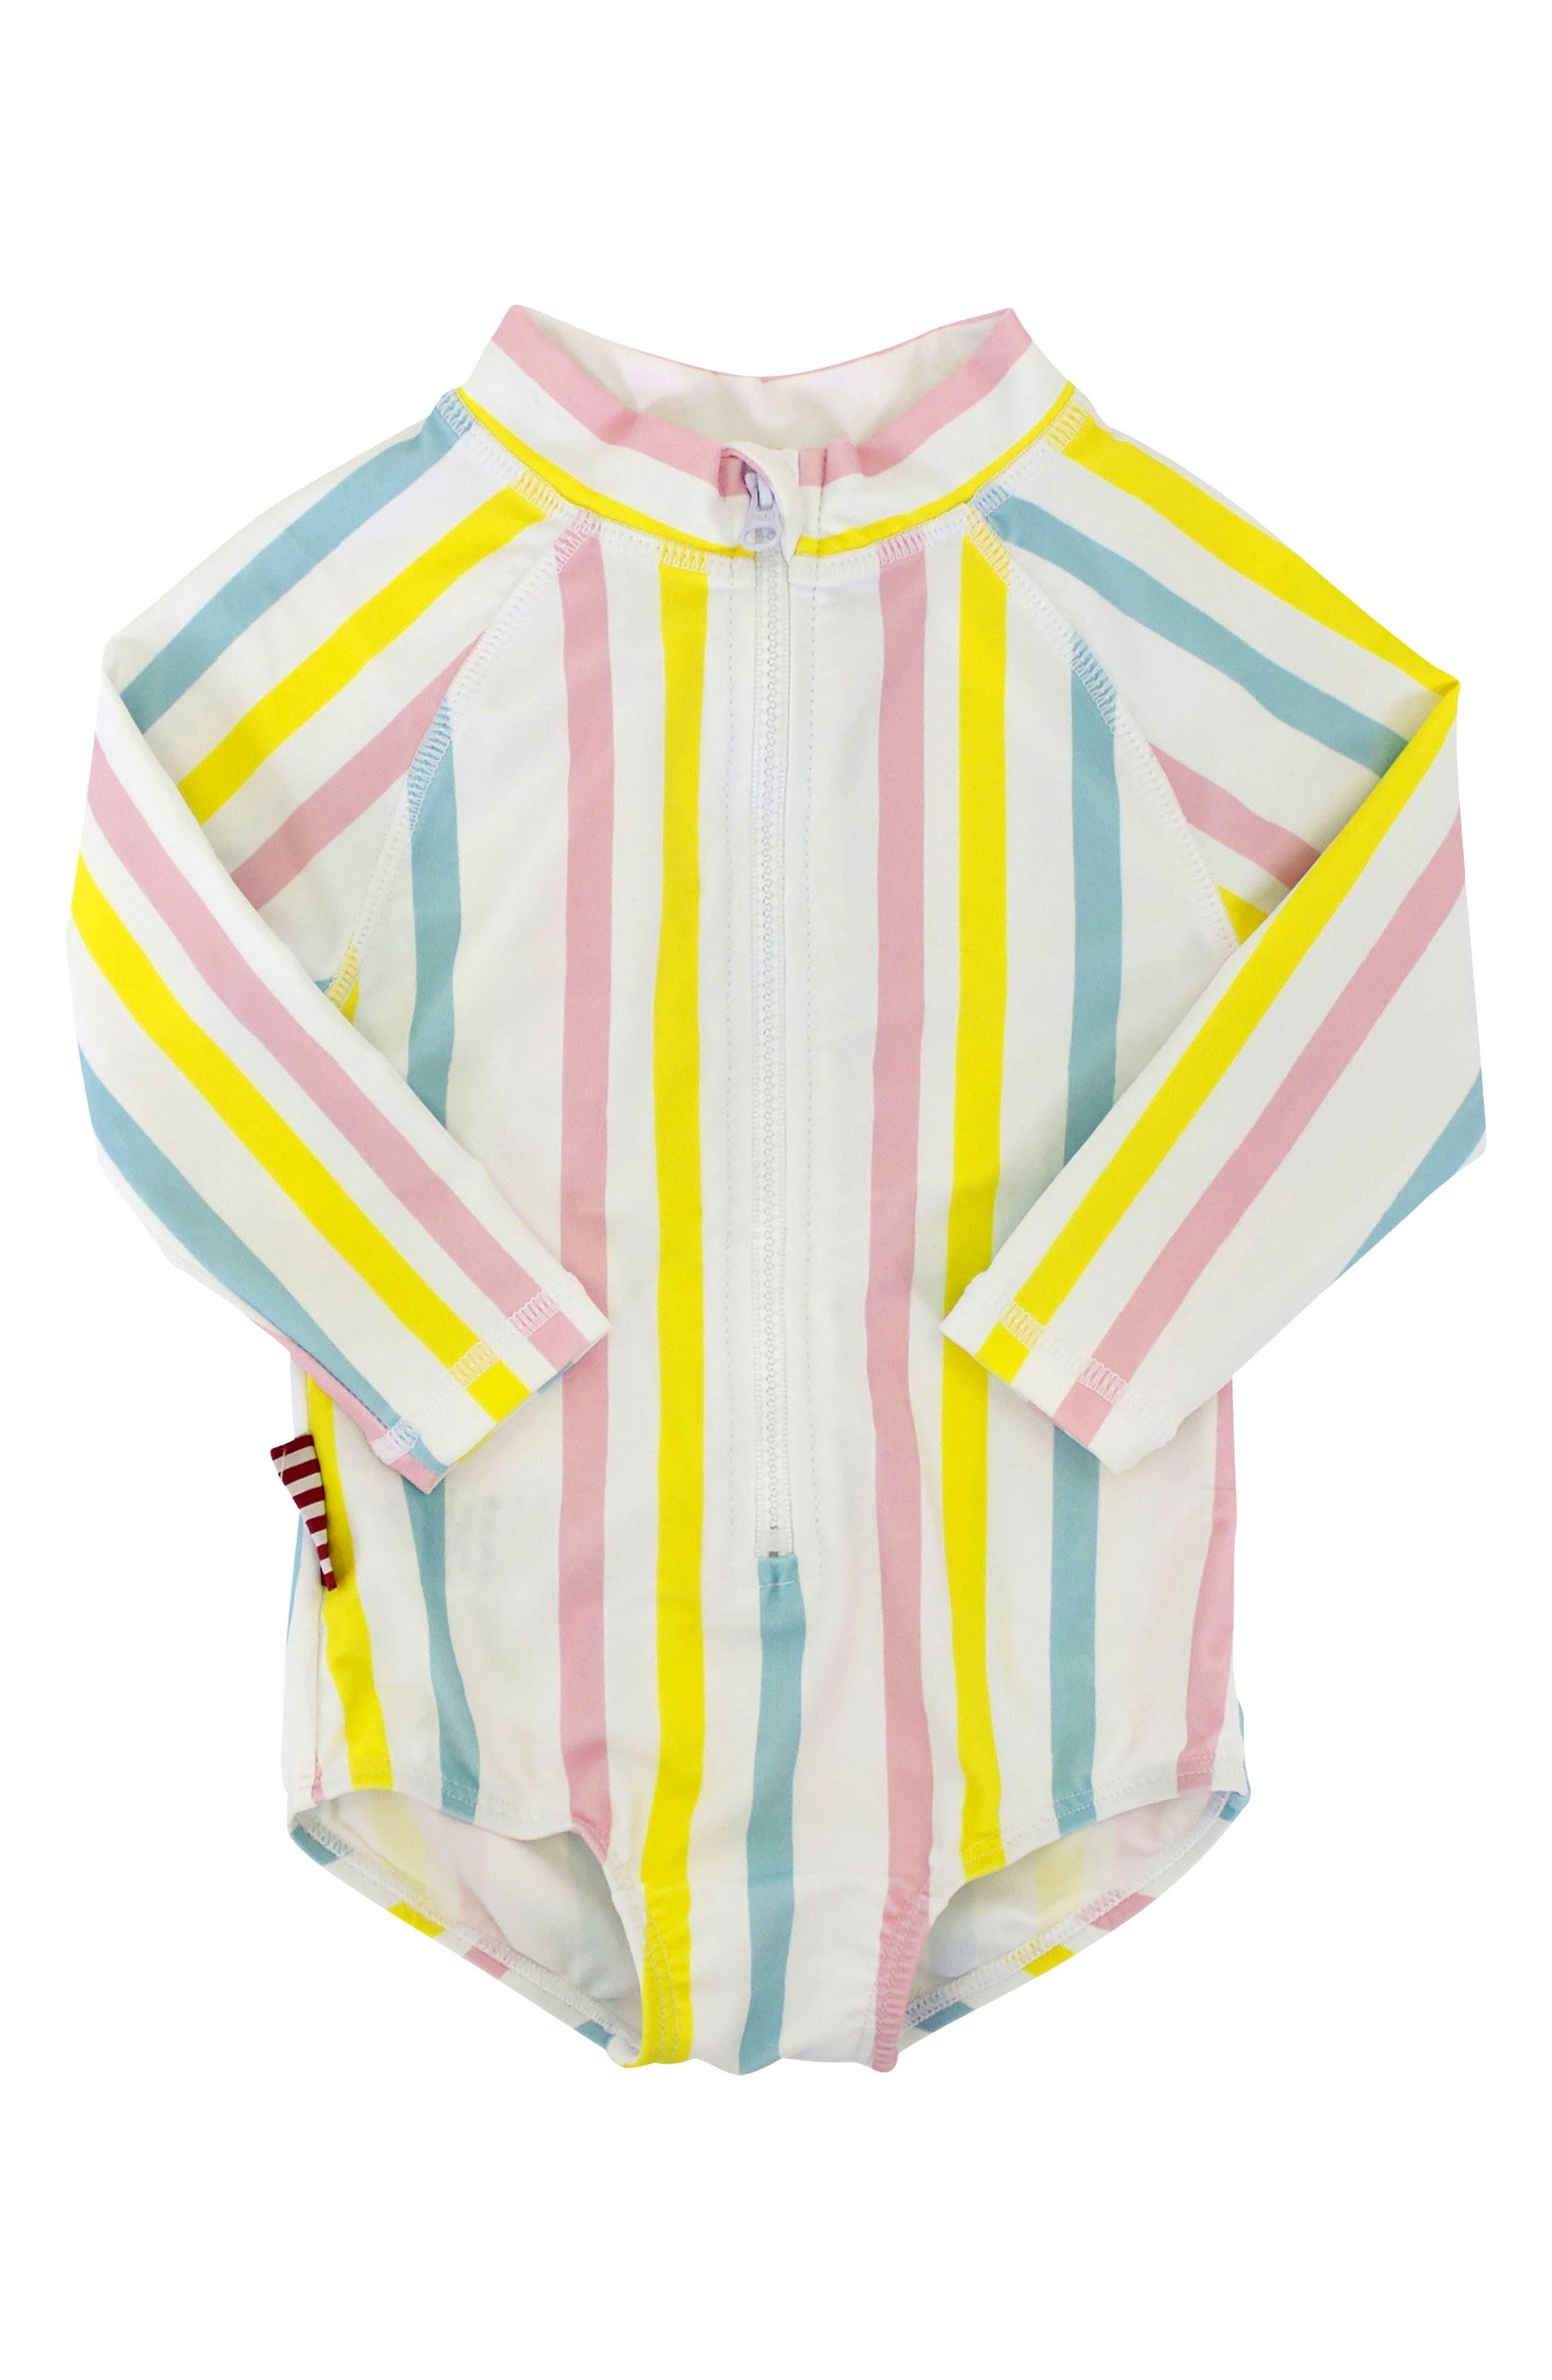 Stripe One-Piece Rashguard Swimsuit,                             Main thumbnail 1, color,                             700